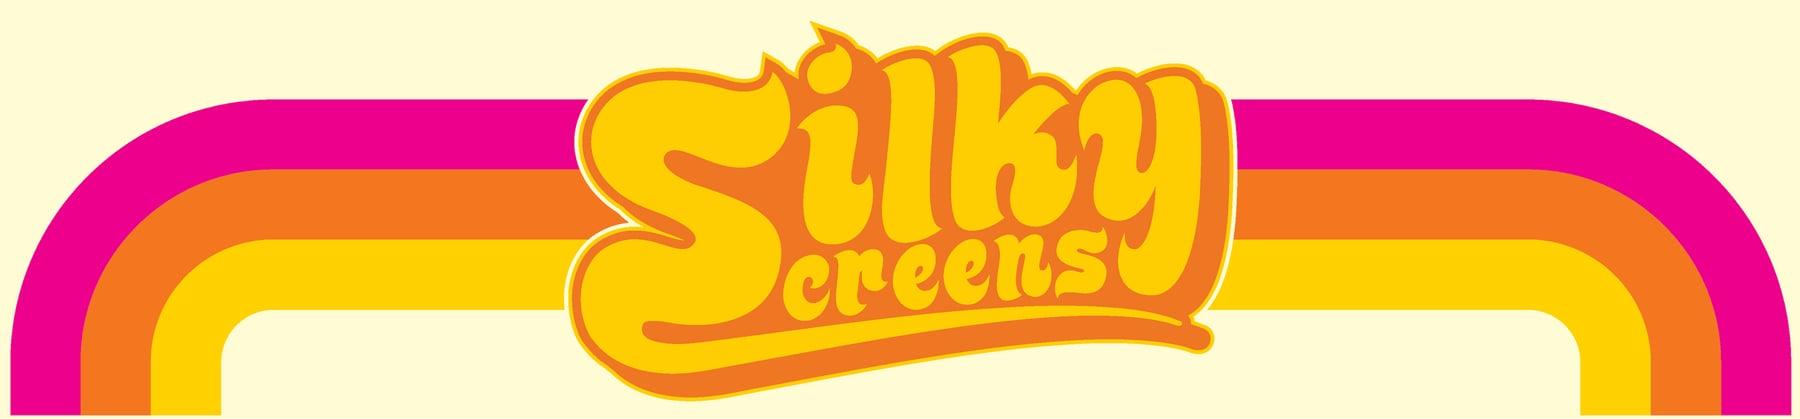 Silky Screens Print Co.